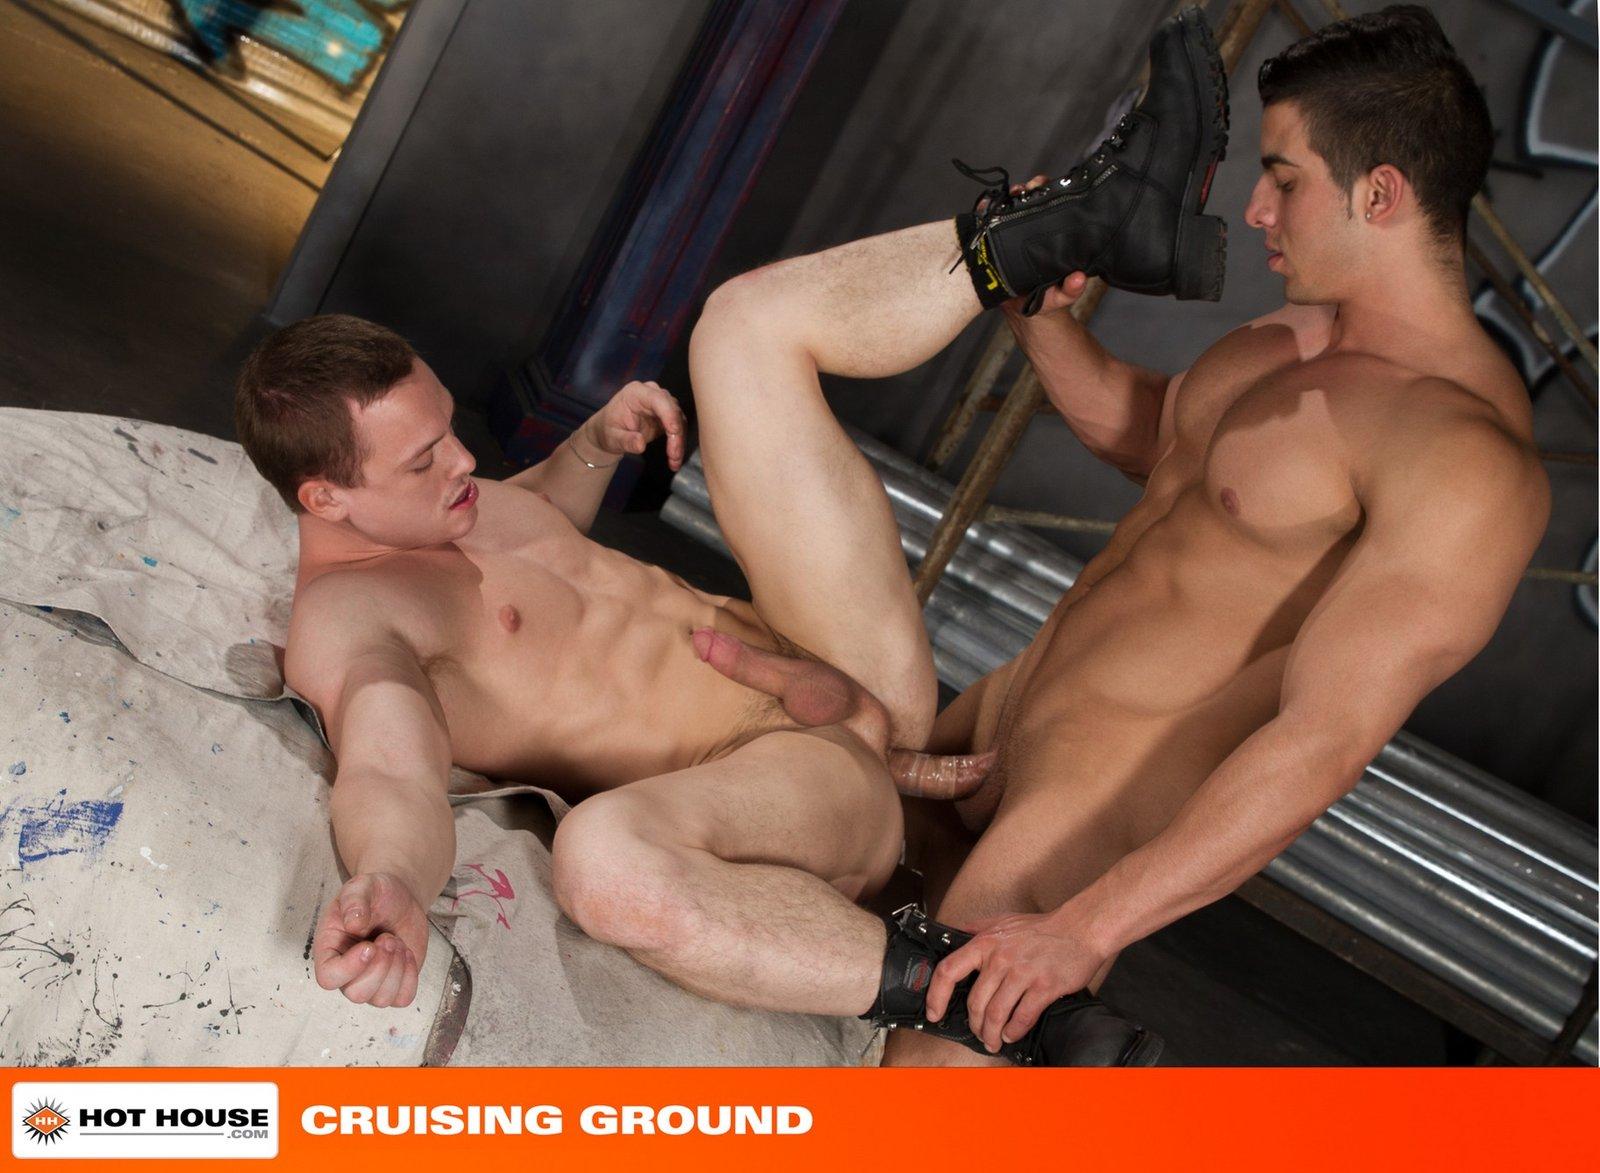 Gay Cruising Gay Men Sex Blog